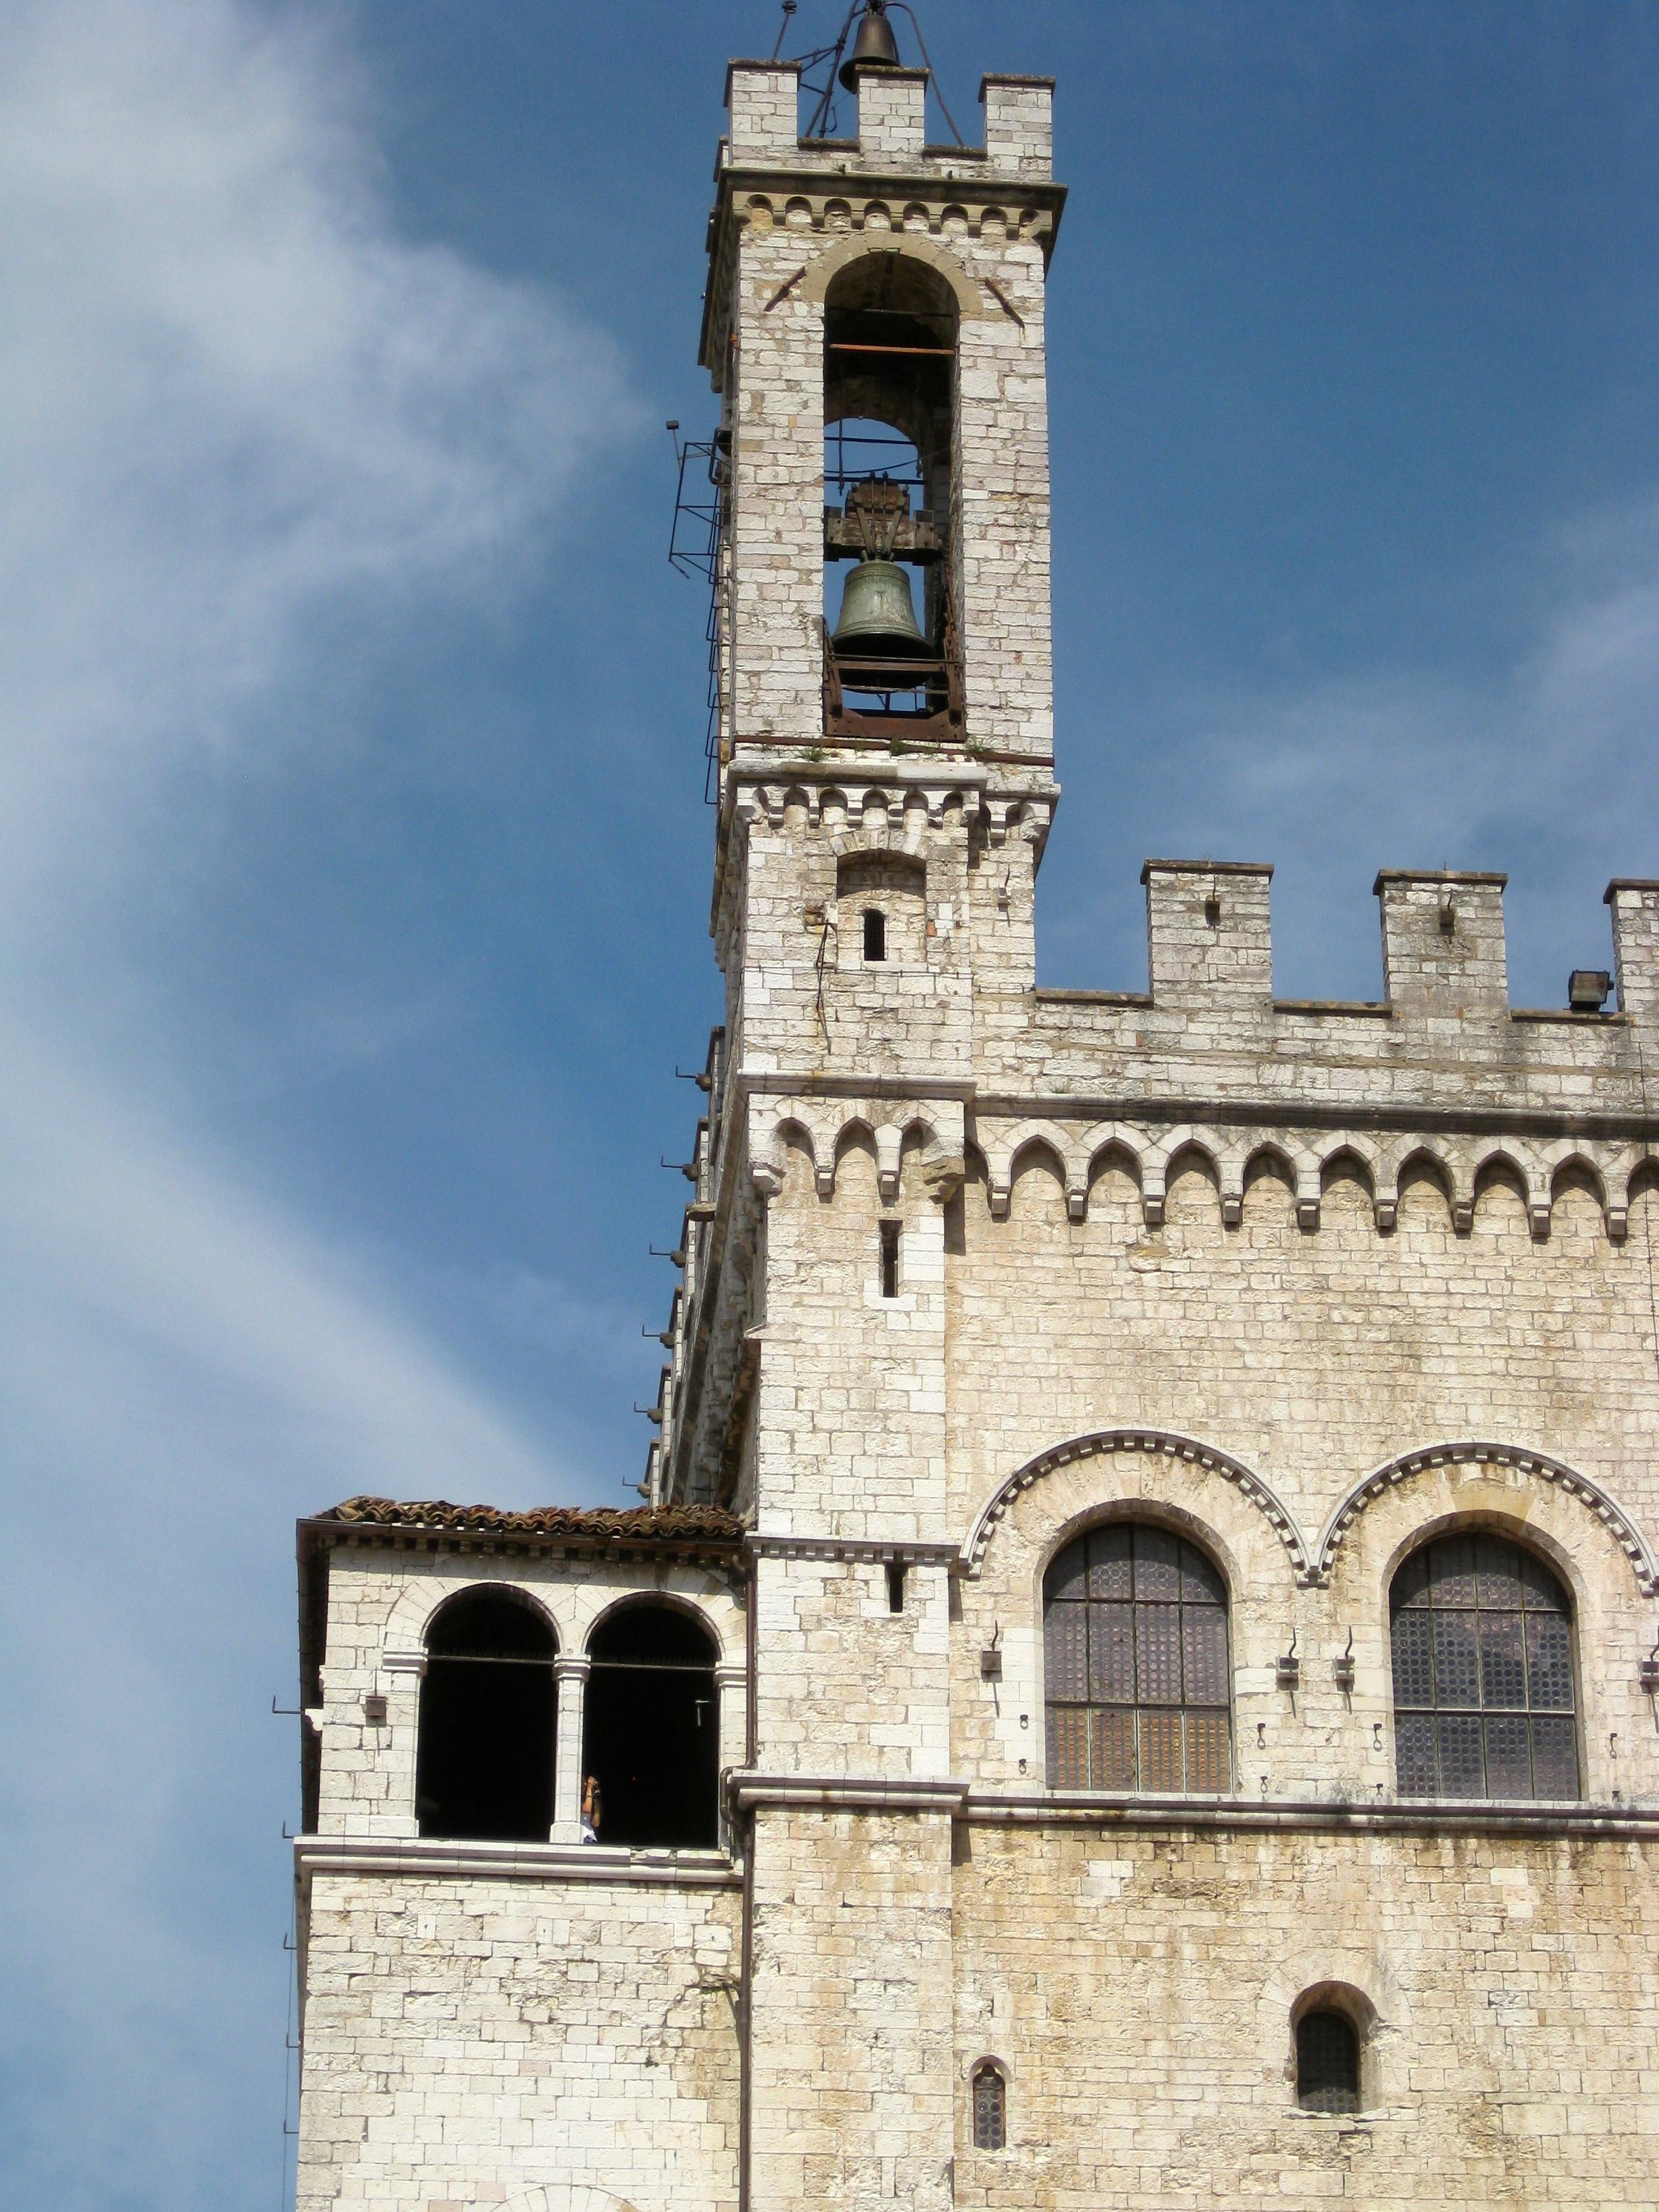 CRO Italy web 2012 - 31.jpg